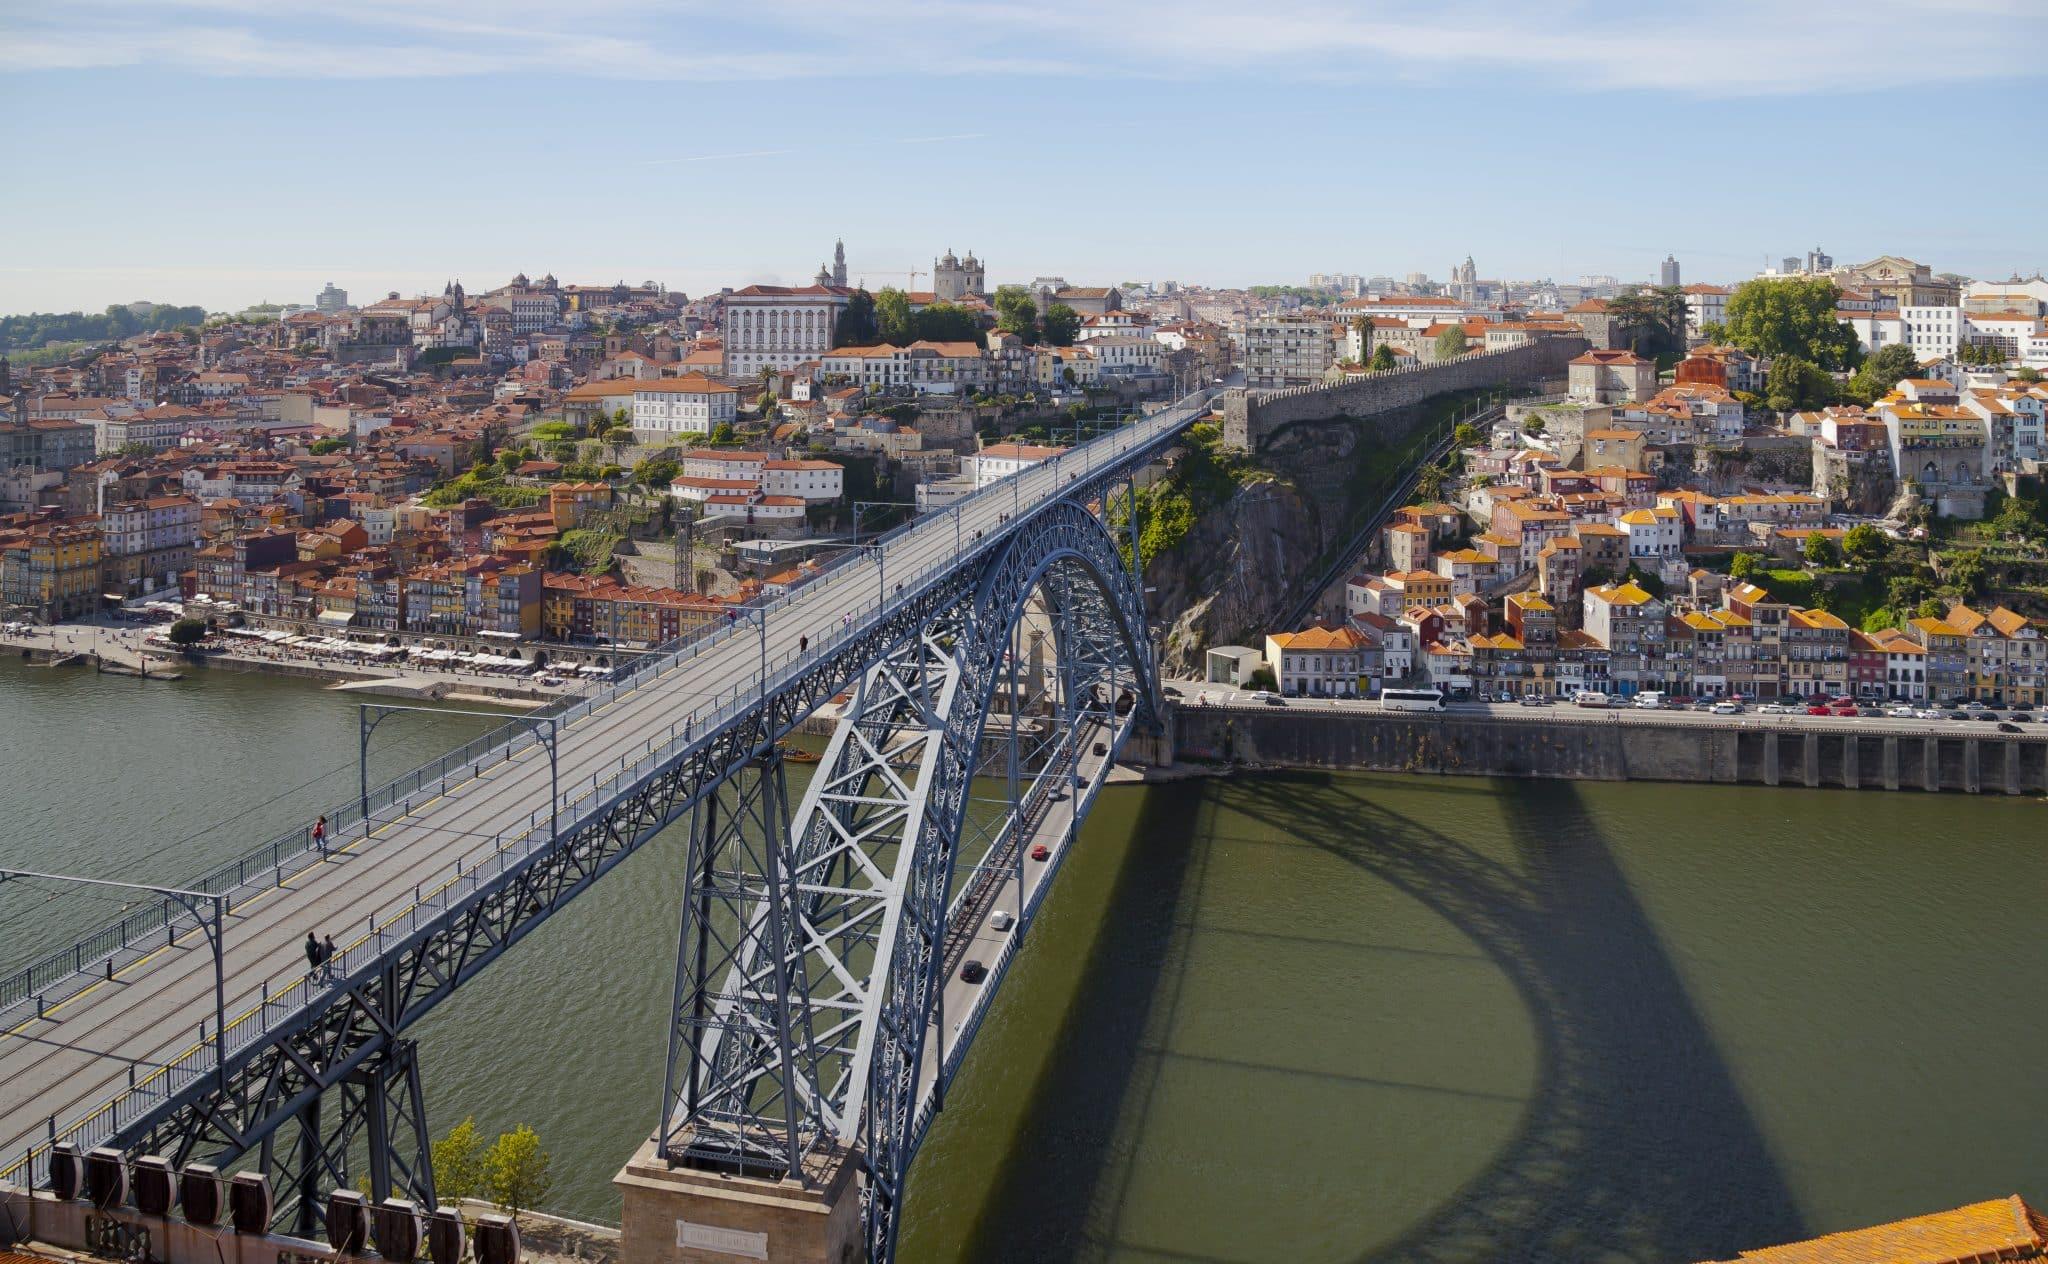 Puente_Don_Luis_I